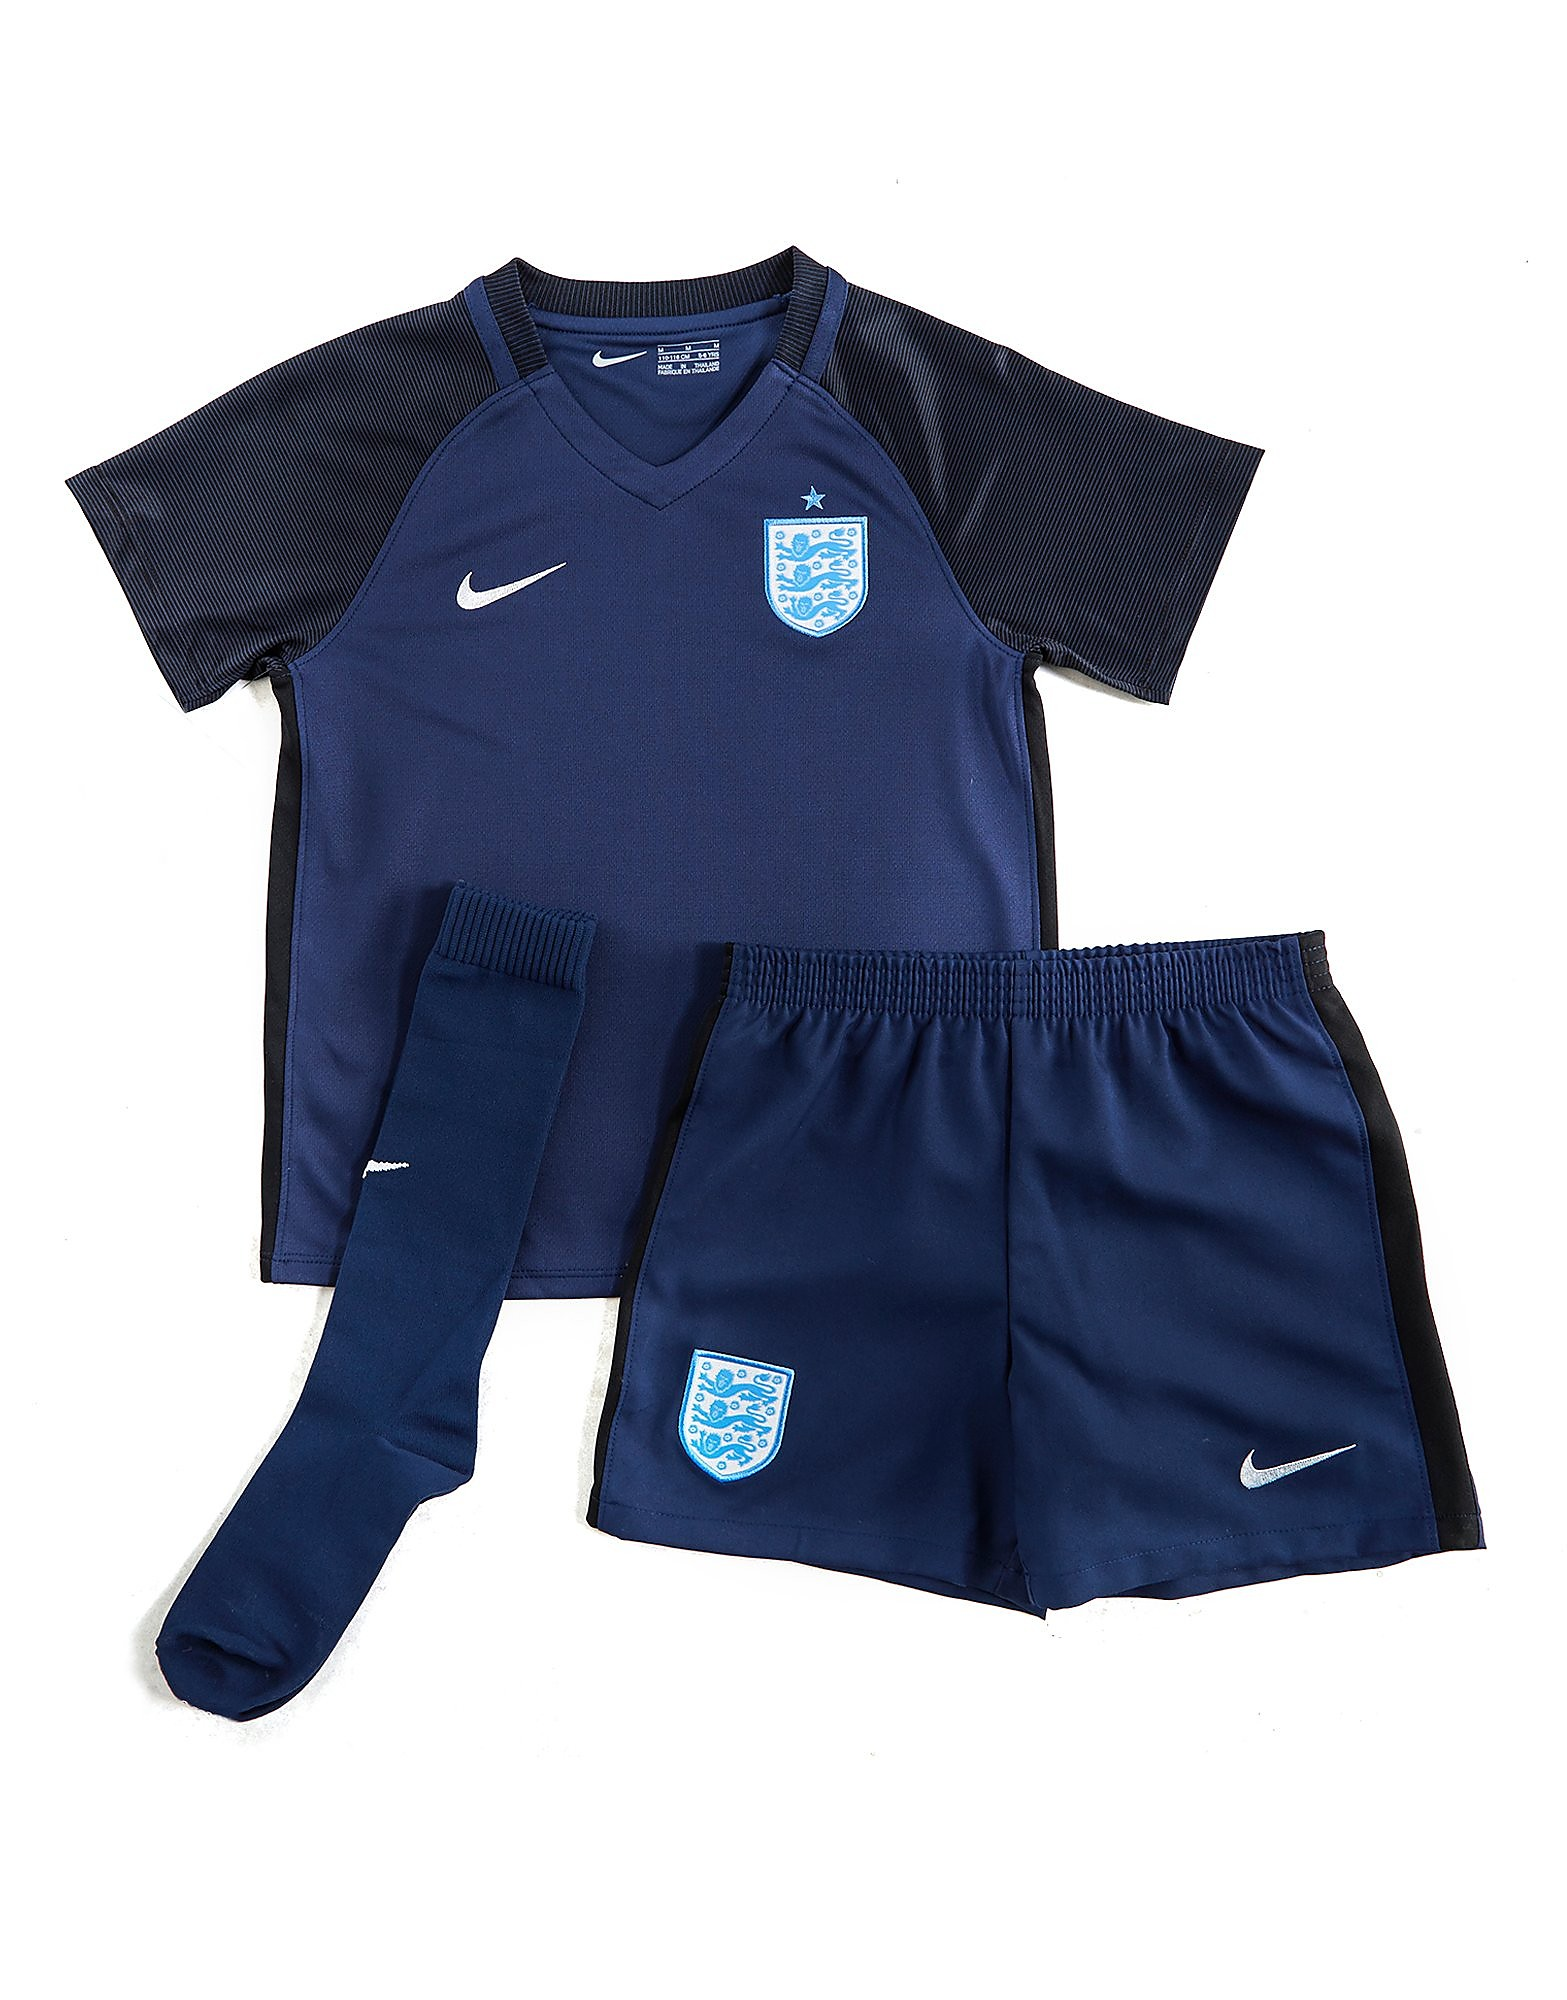 Nike England 2017/18 Children's Away Shirt